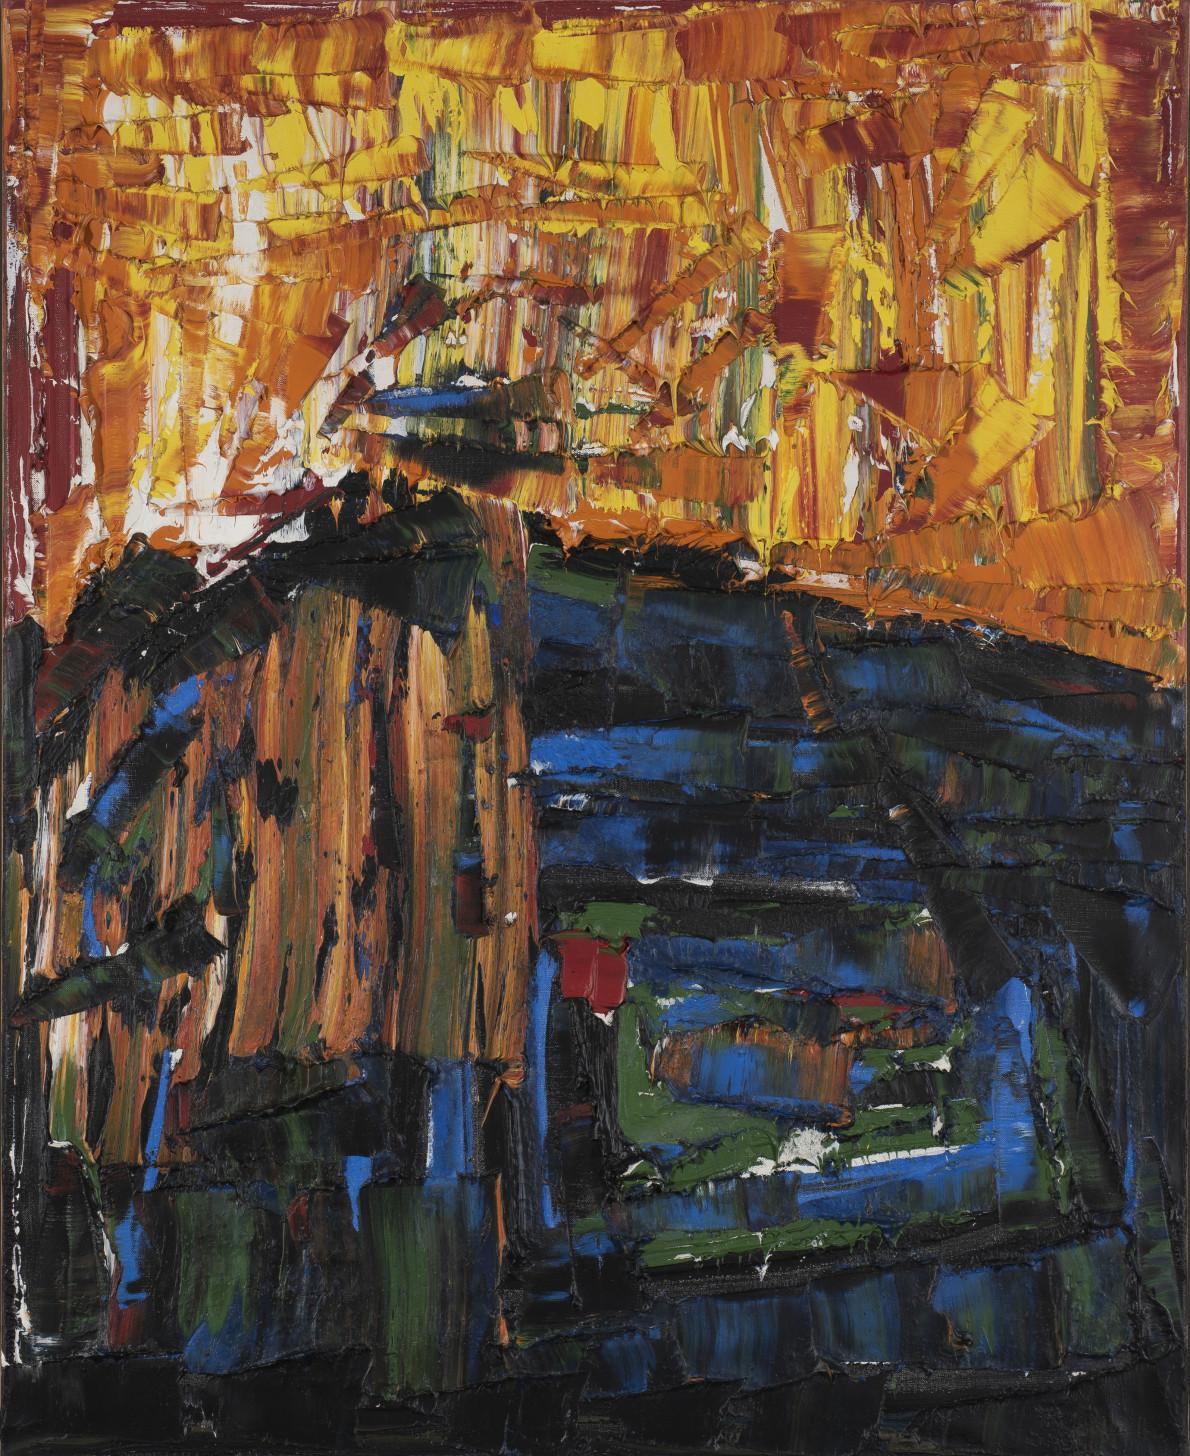 Jean-Paul Riopelle, Composition, c.1974